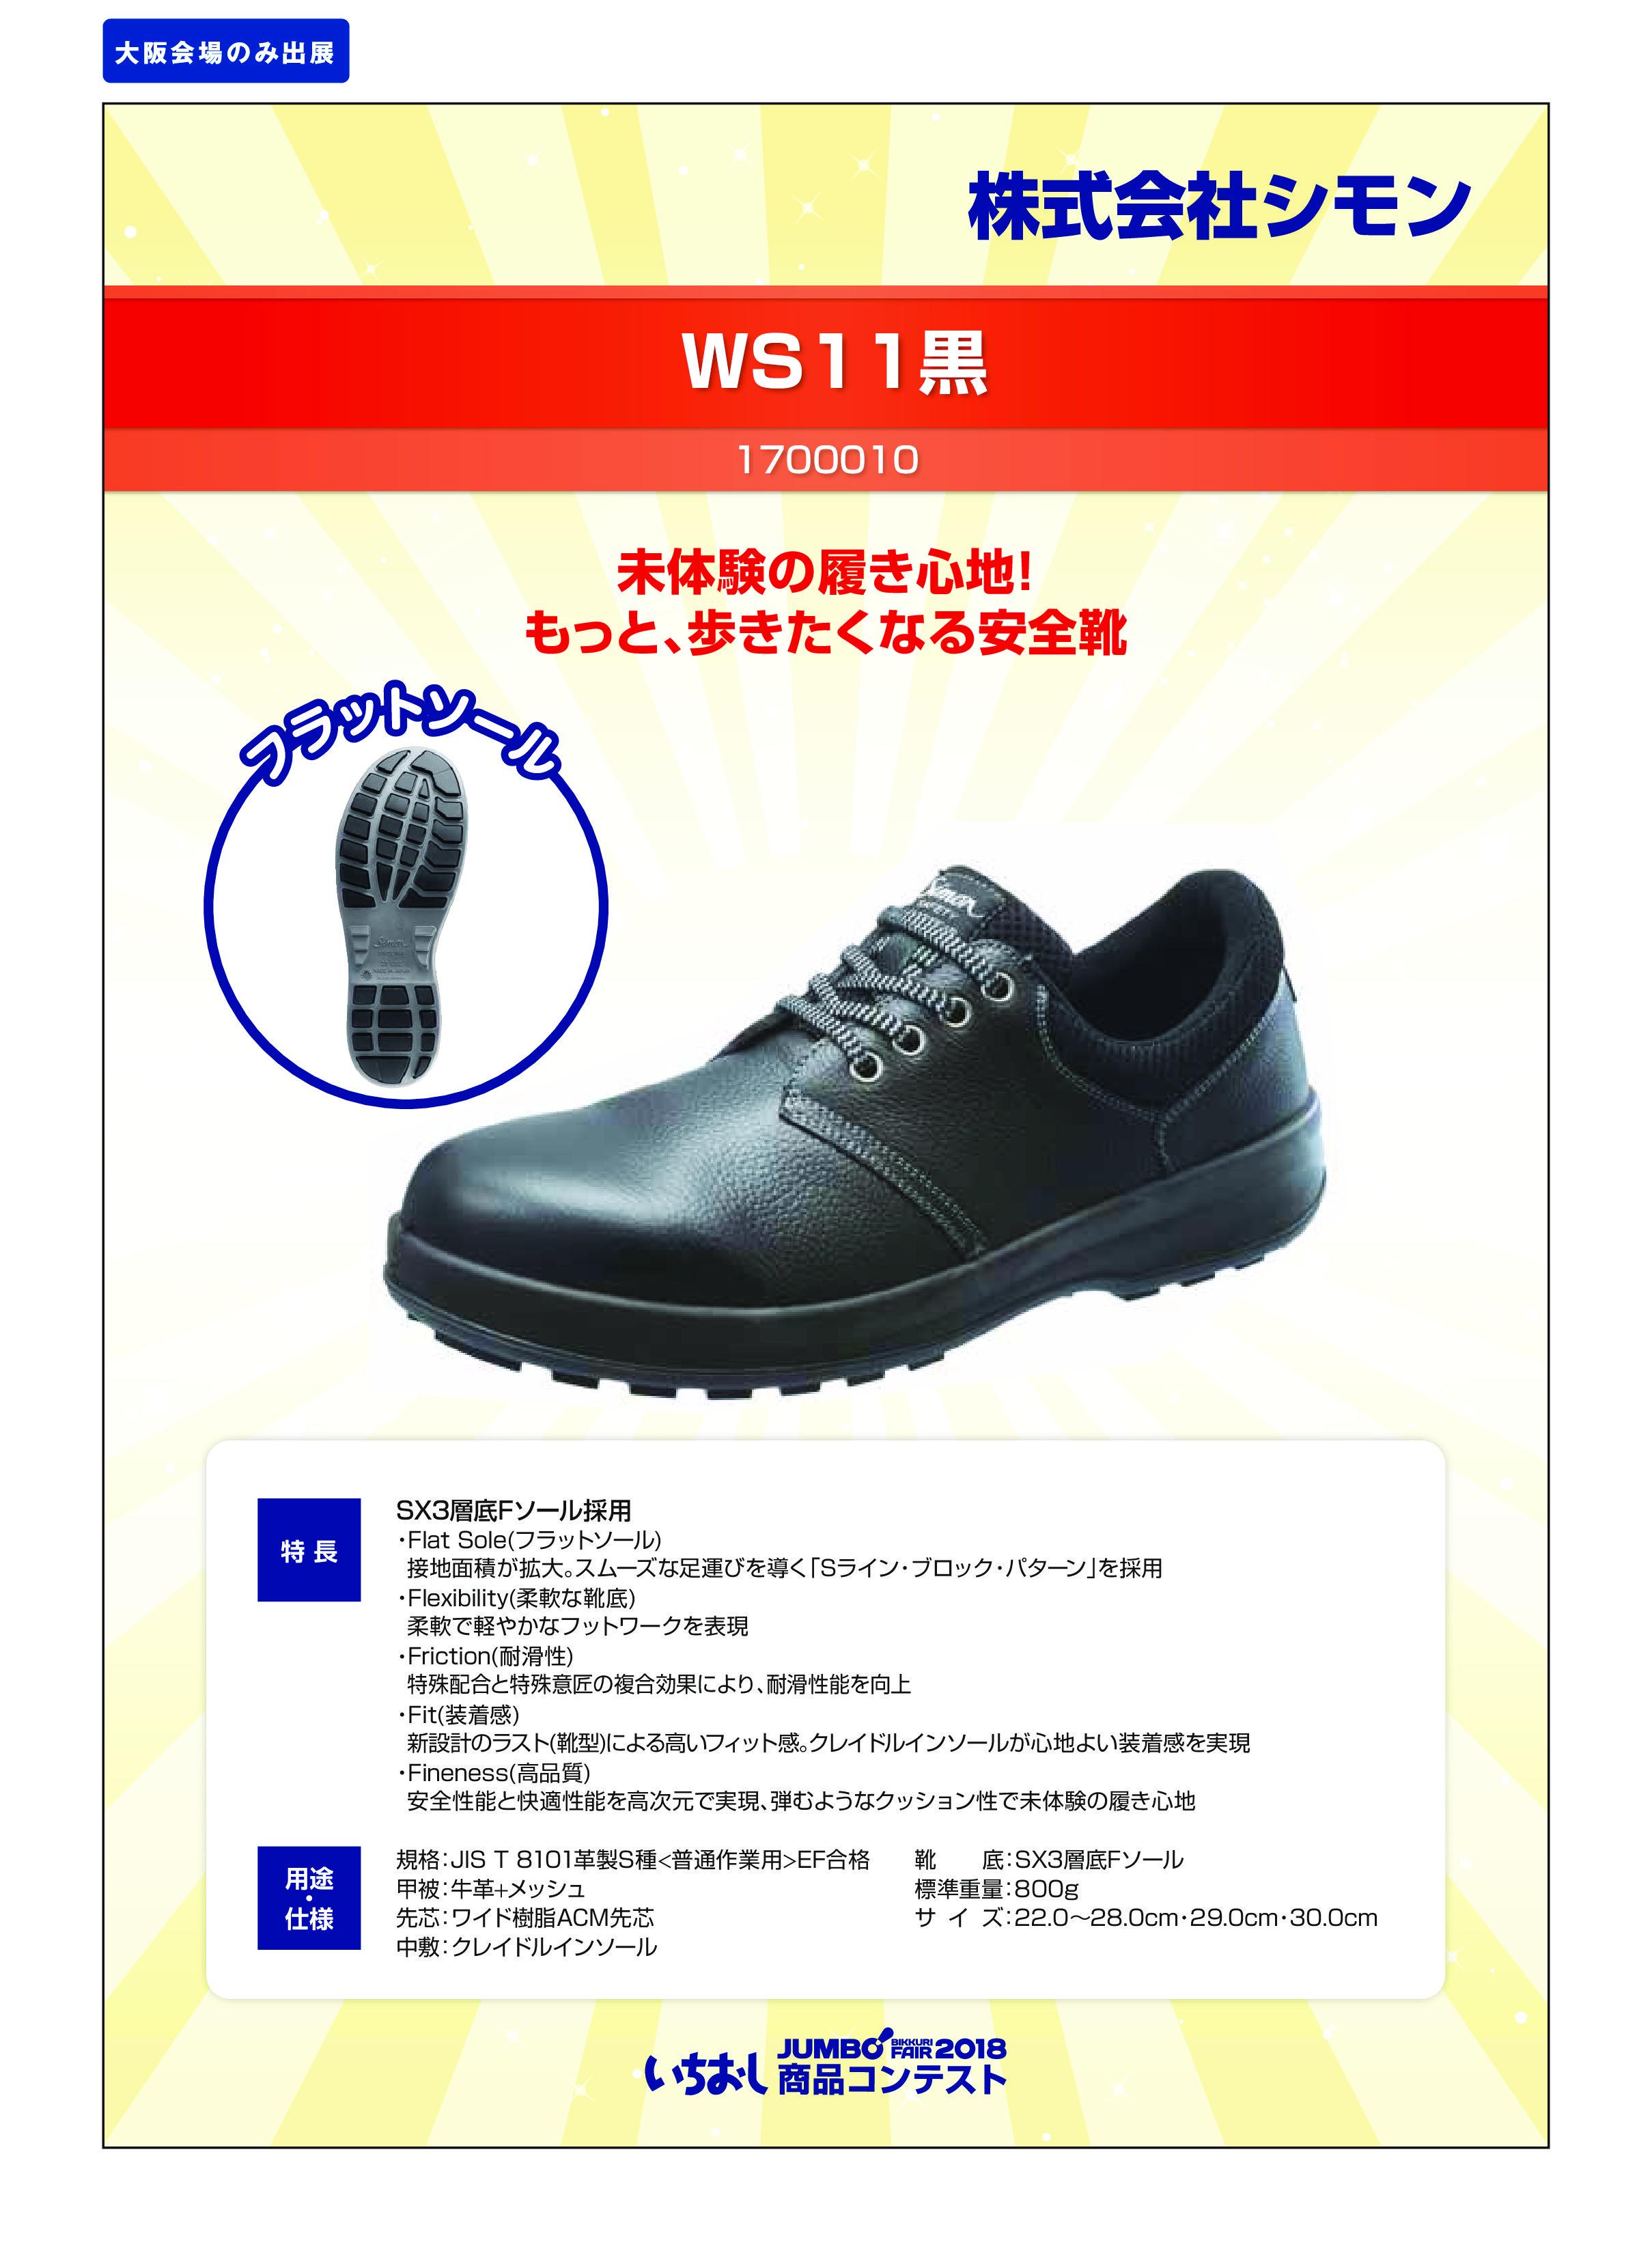 「WS11黒」株式会社シモンの画像